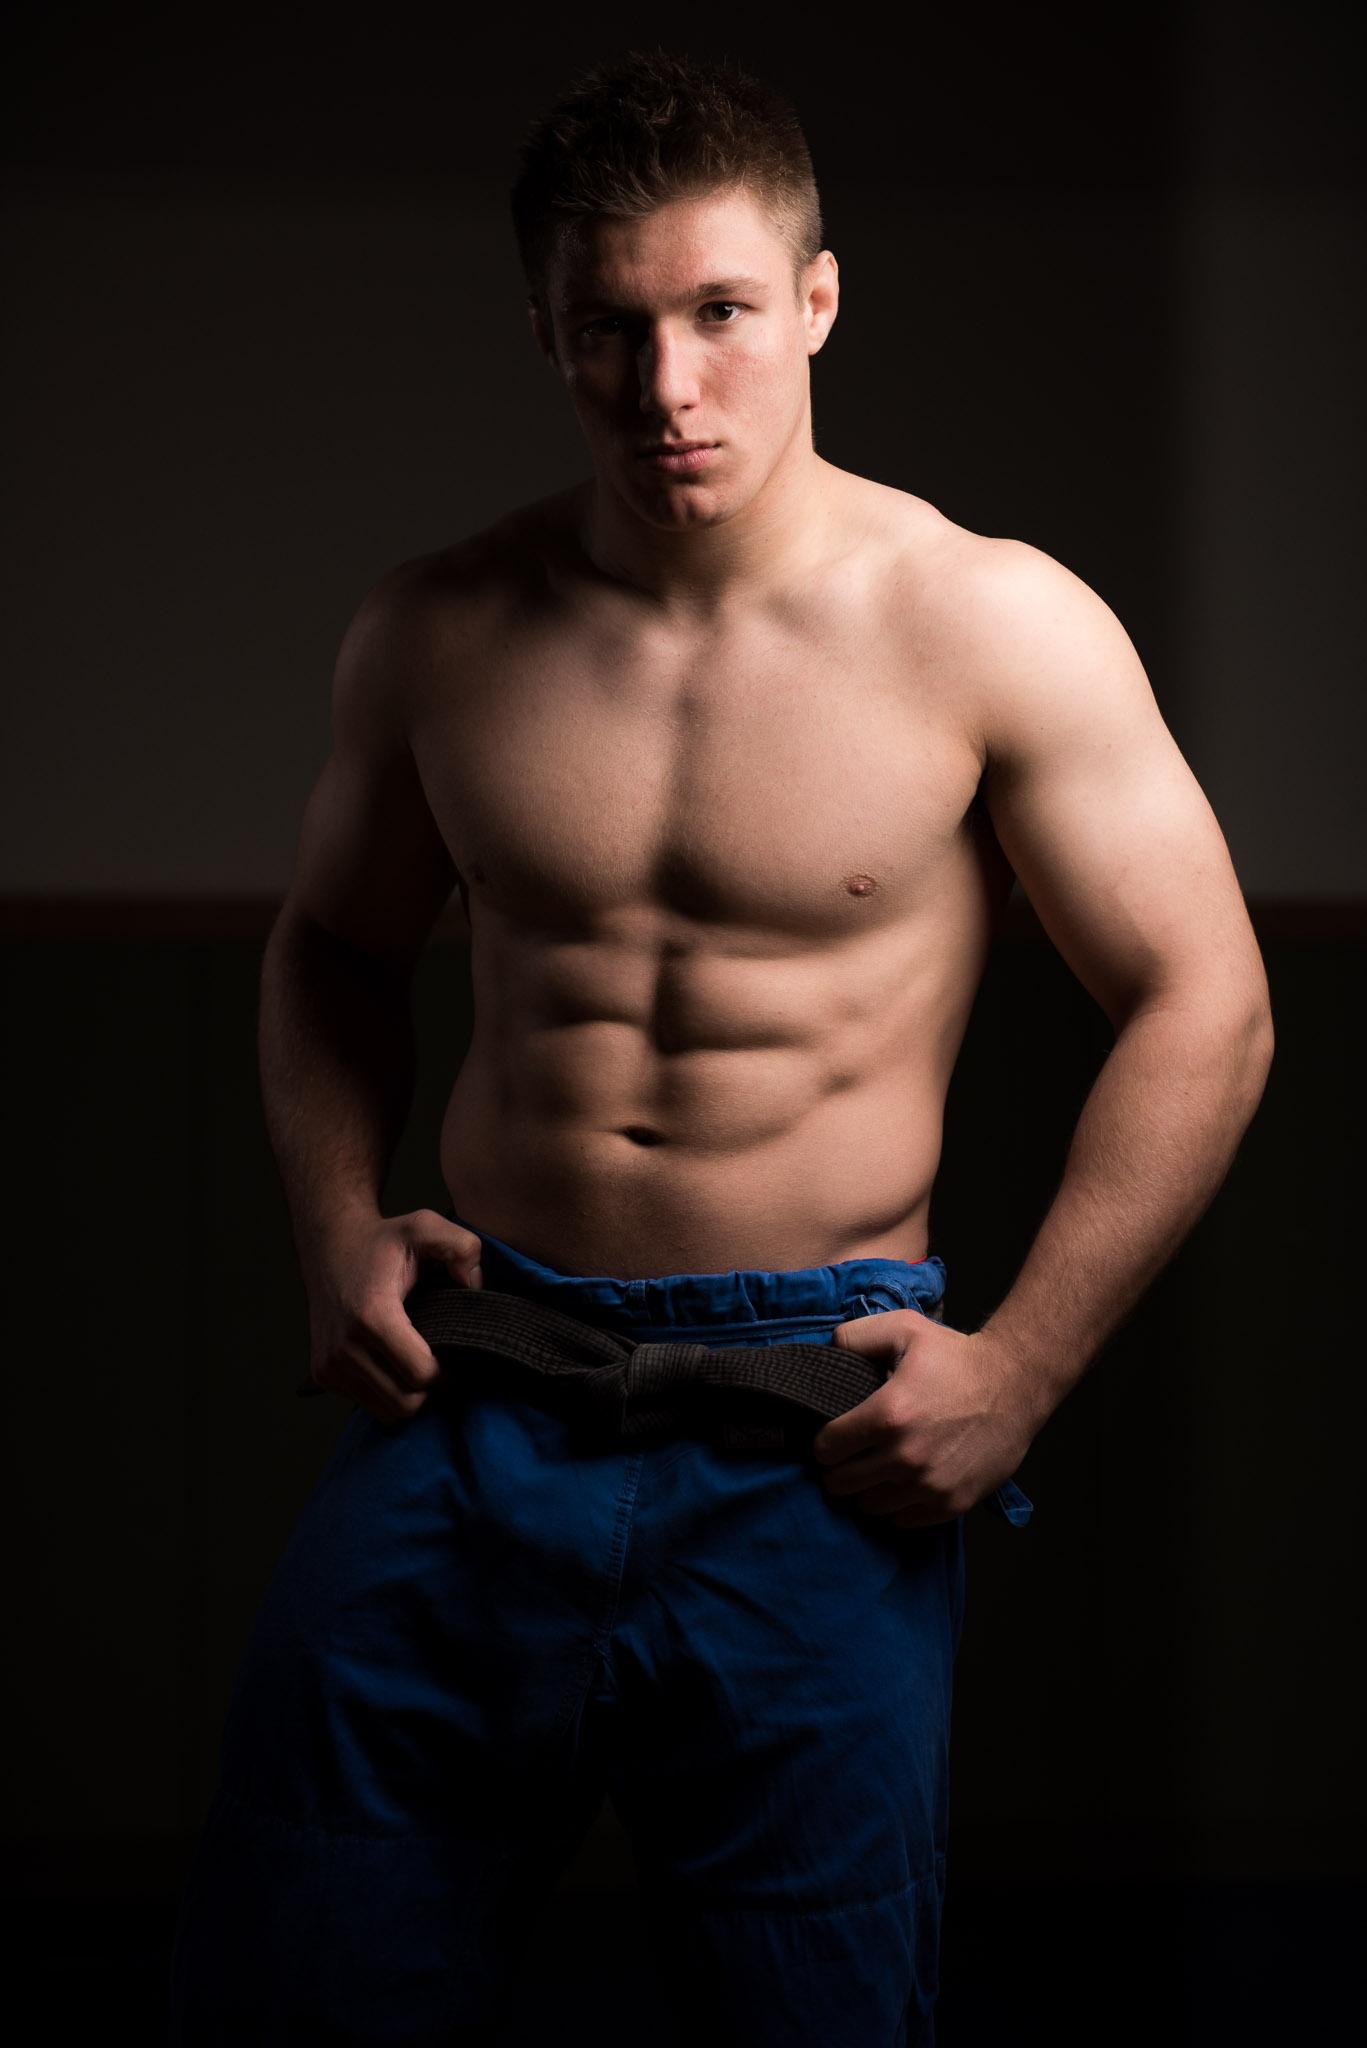 Harrison Melbourne's fitness models